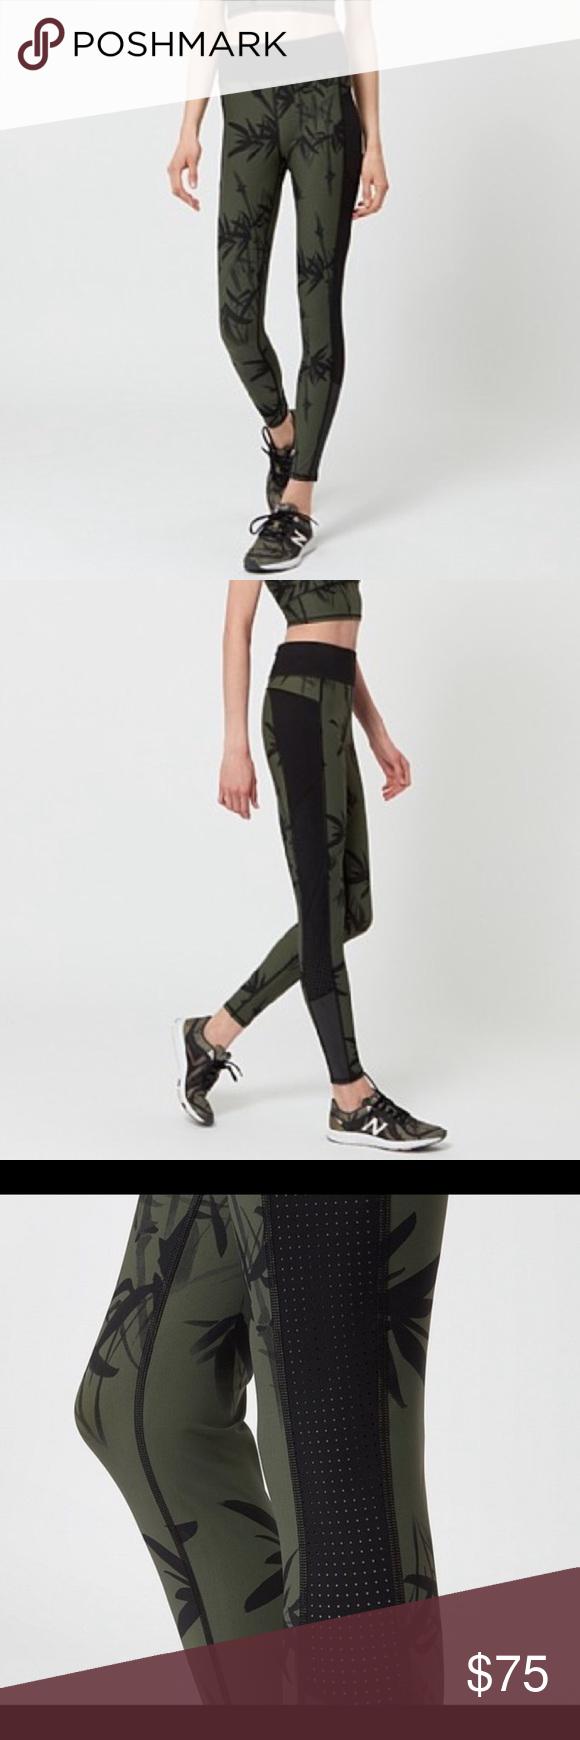 fd387102319ba Sweaty Betty Zero Gravity Run Leggings camo size M Sweaty Betty zero  gravity run leggings size medium